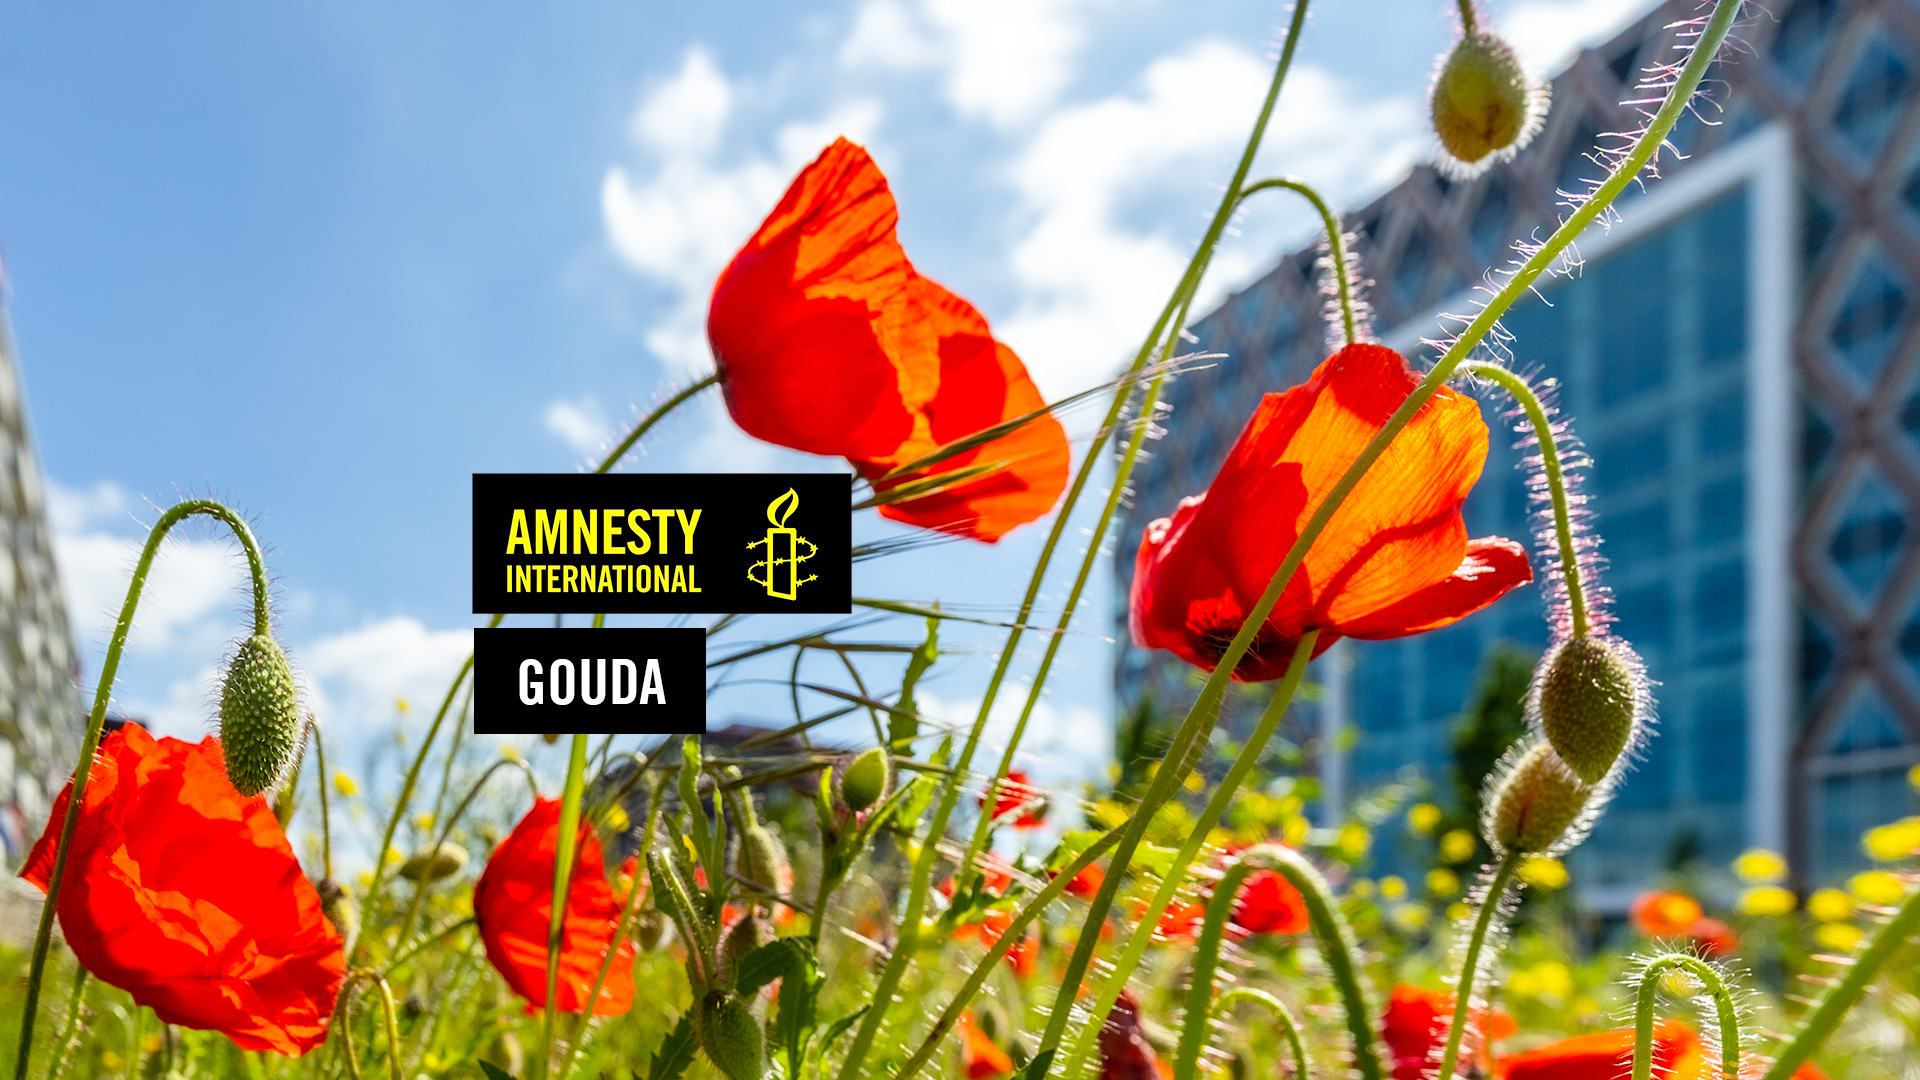 Amnesty International Gouda